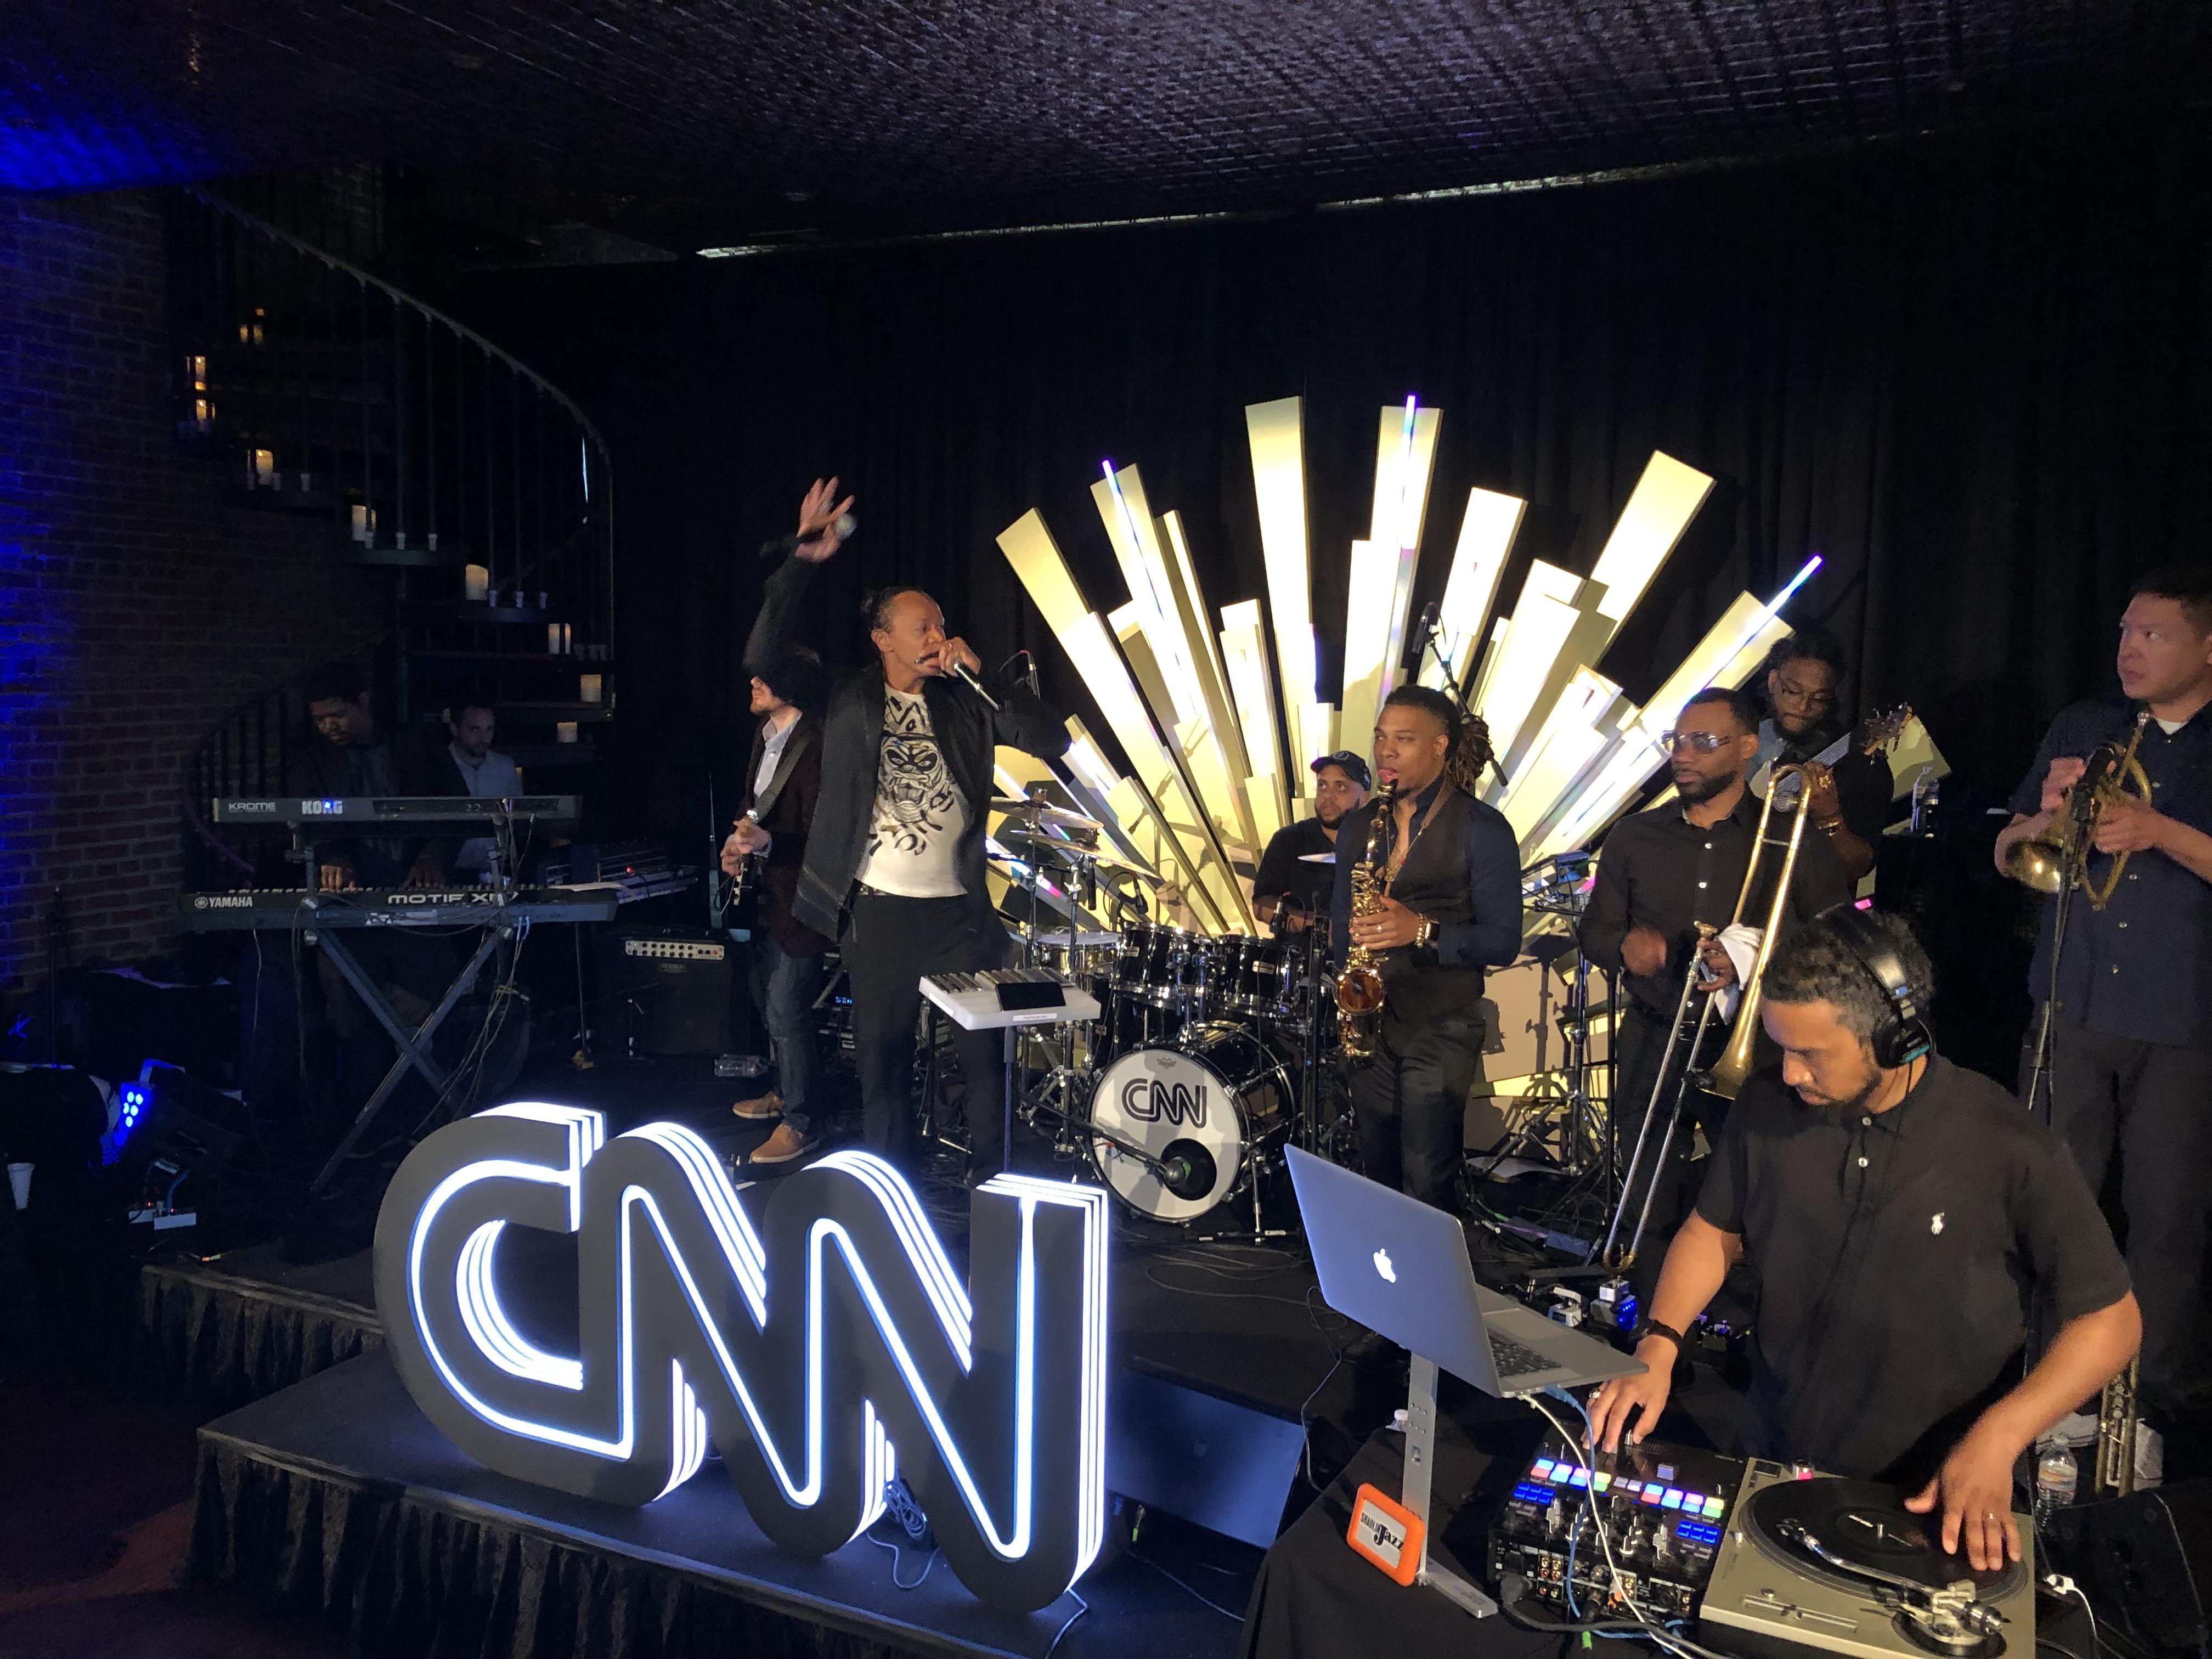 Event Producer & Stage Manager @ CNN Political Hangover Brunch